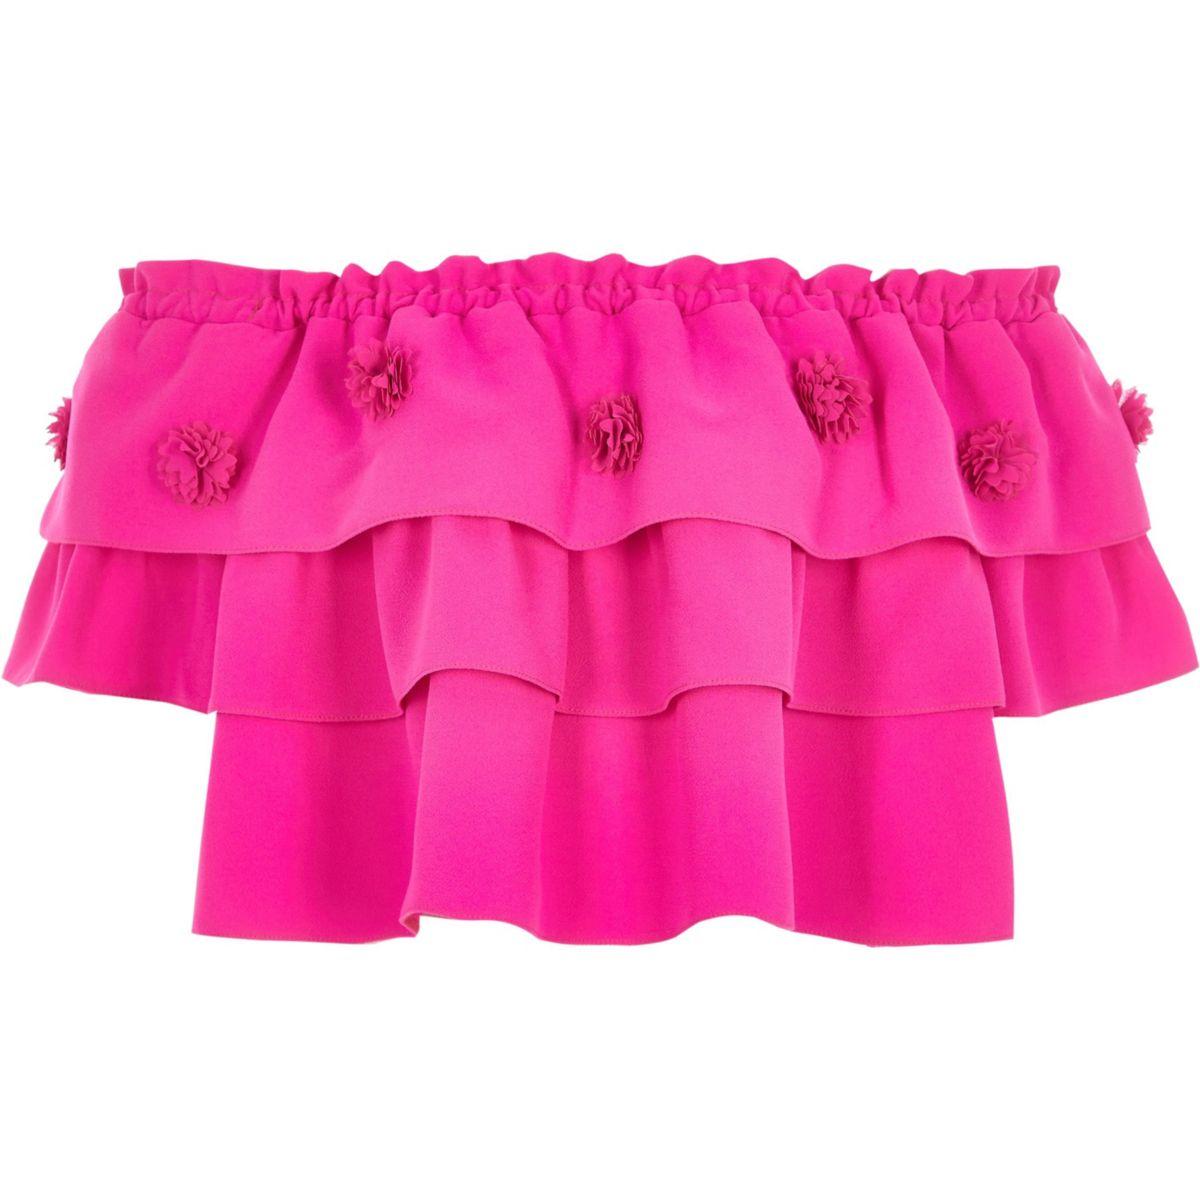 Girls pink RI Studio frill layered top